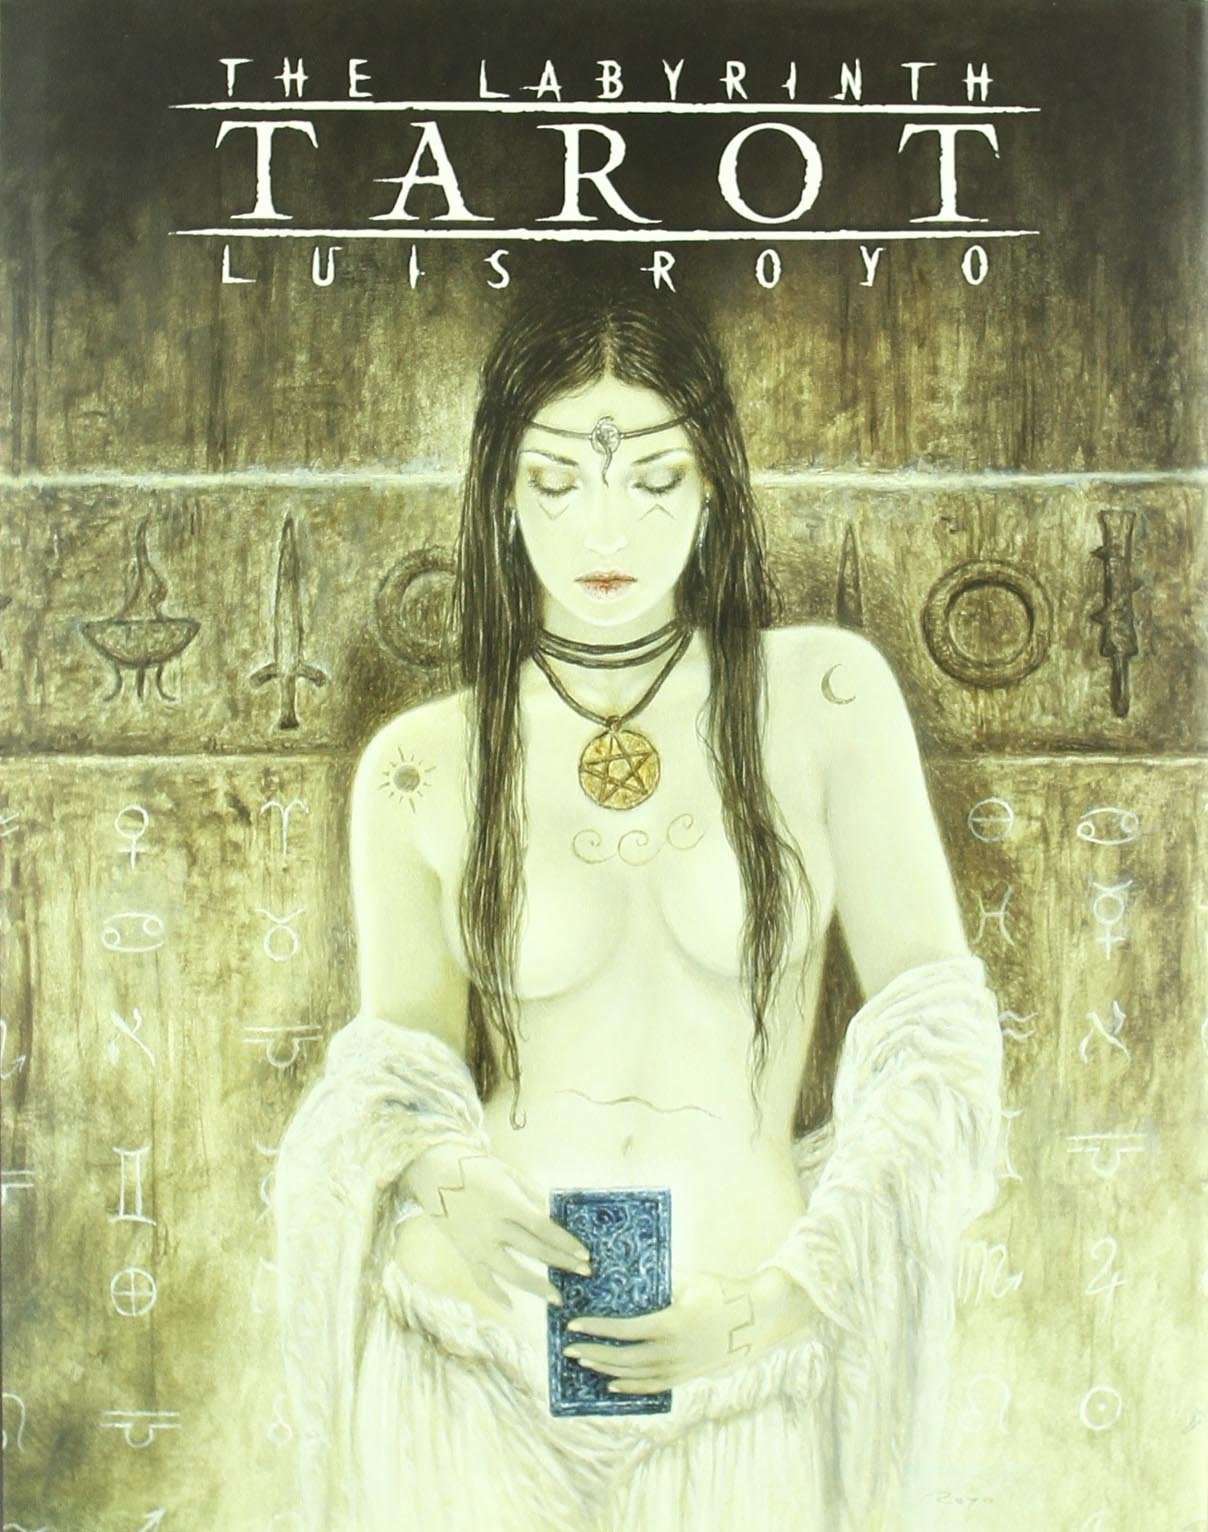 The Labyrinth-Tarot, Luxusausgabe (LUIS ROYO LIBROS)